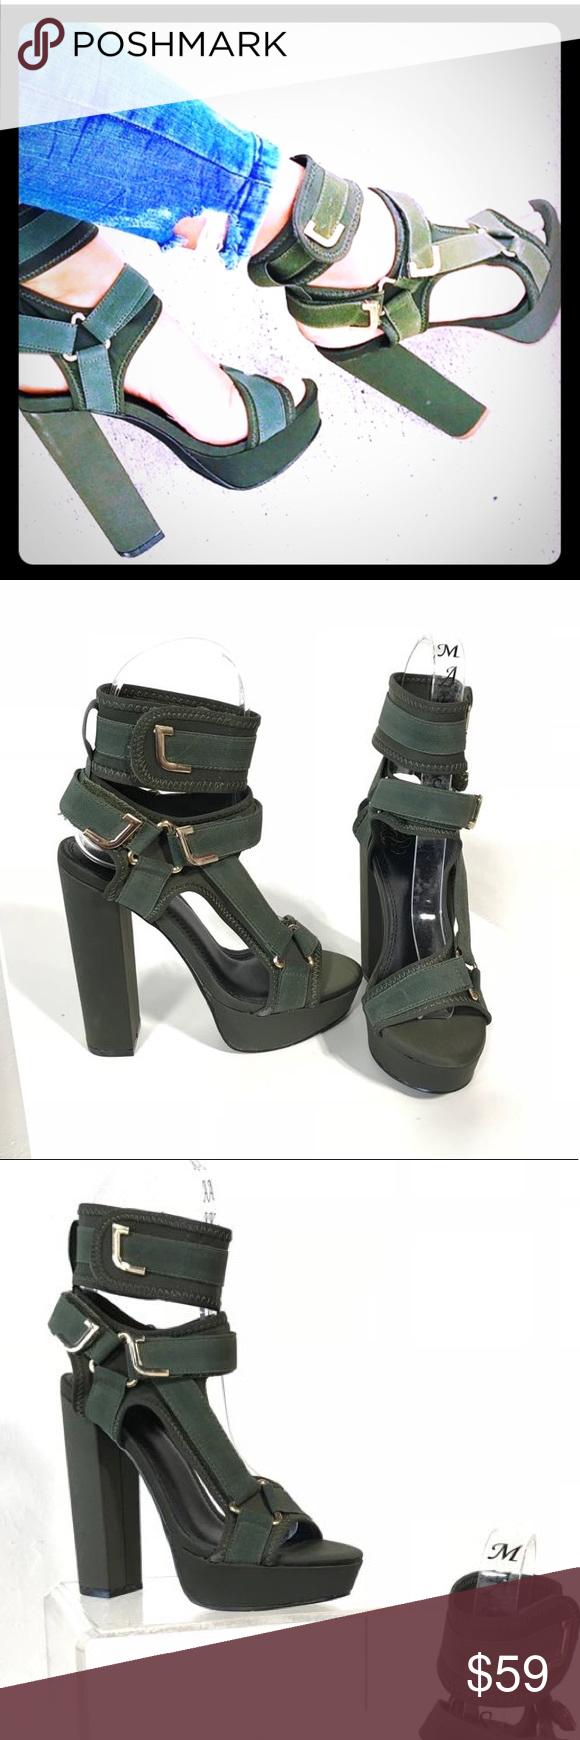 8dc45c38bf6 Liliana Glamrock Olive Green Heels Beautiful strappy heels by Liliana. Block  heels and platform. Medium width and true to size. Liliana Shoes Heels